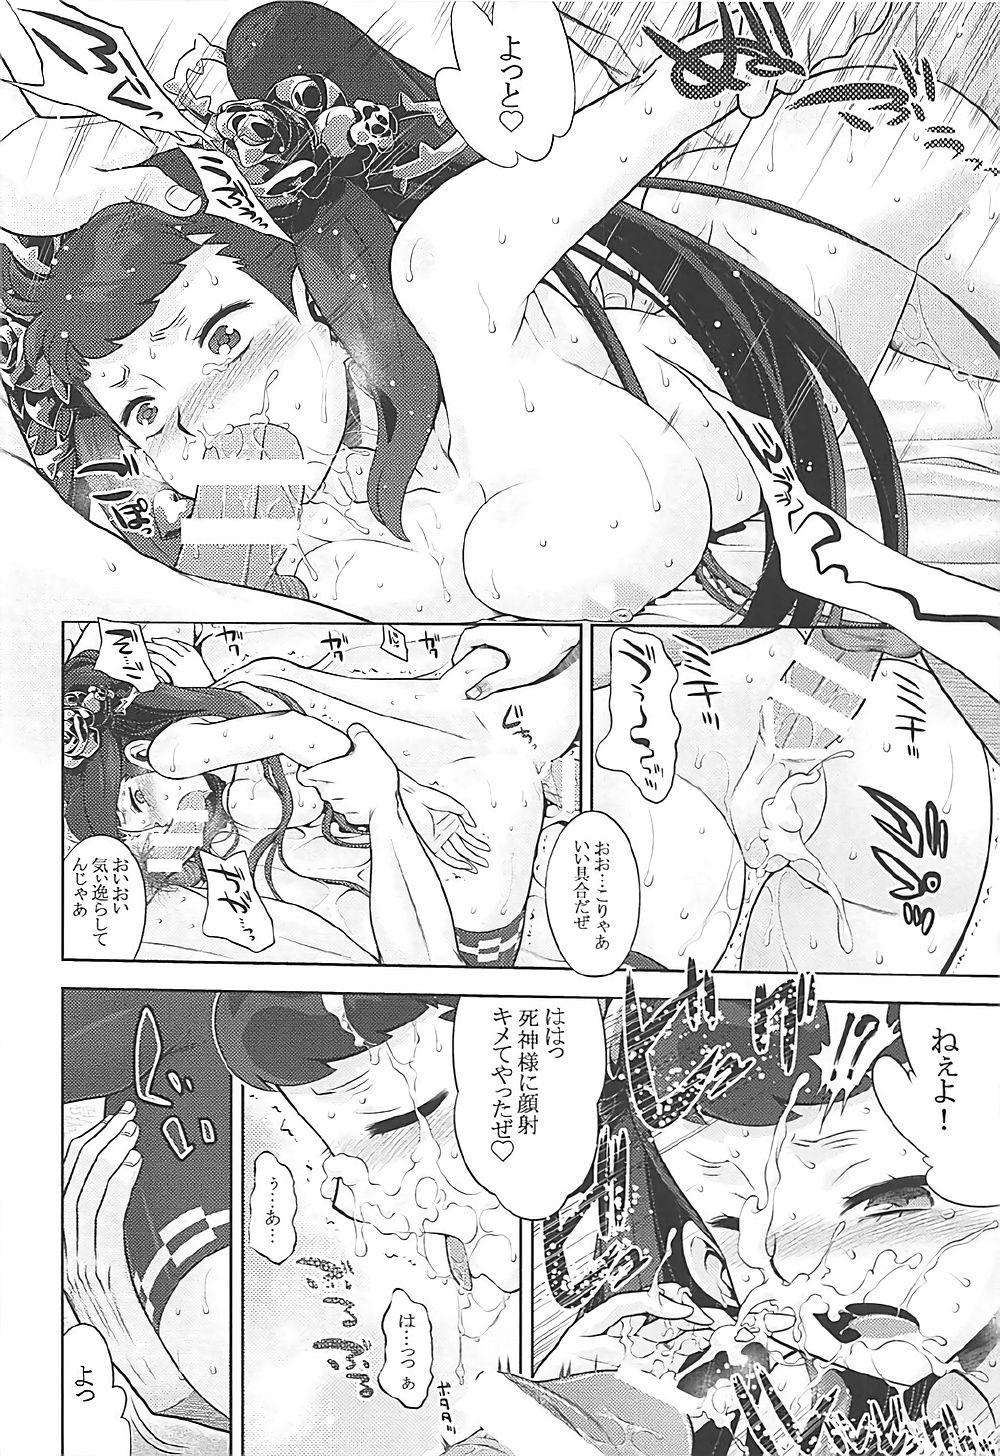 Sekaiju no Anone 29 Lilisoro Hard 10